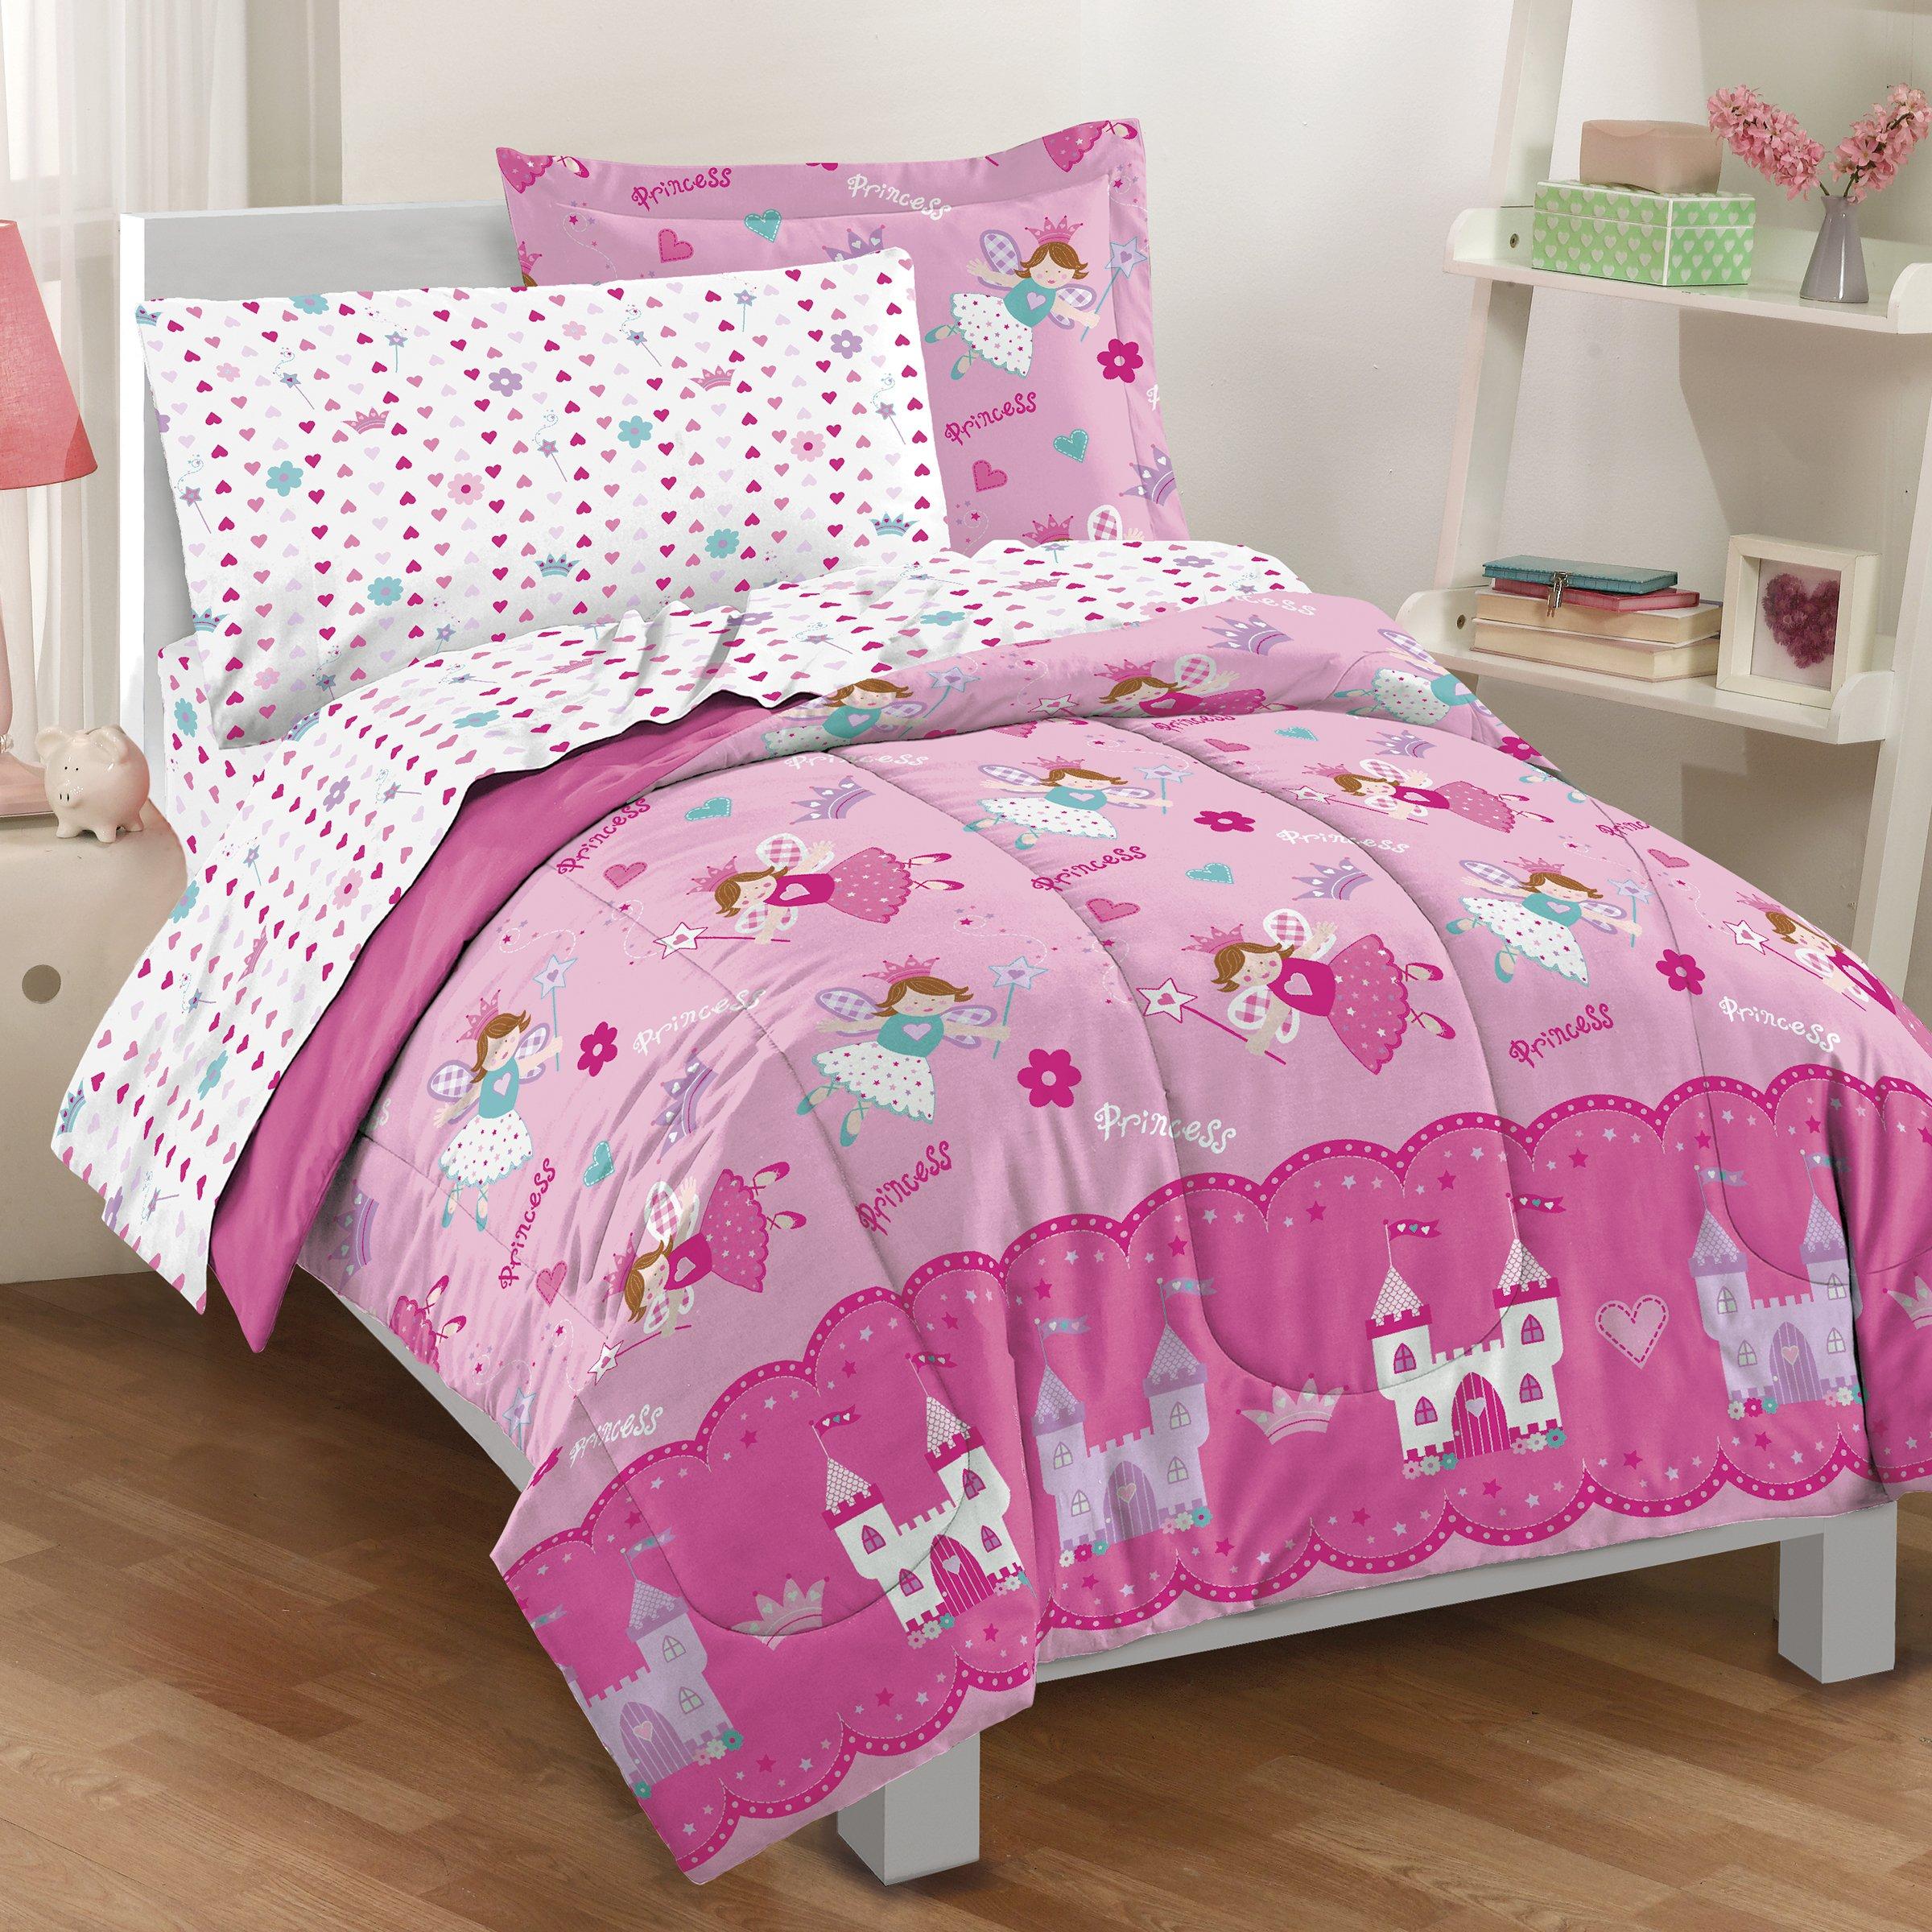 Dream Factory Magical Princess 4 Piece Bedding Set, Toddler, Pink